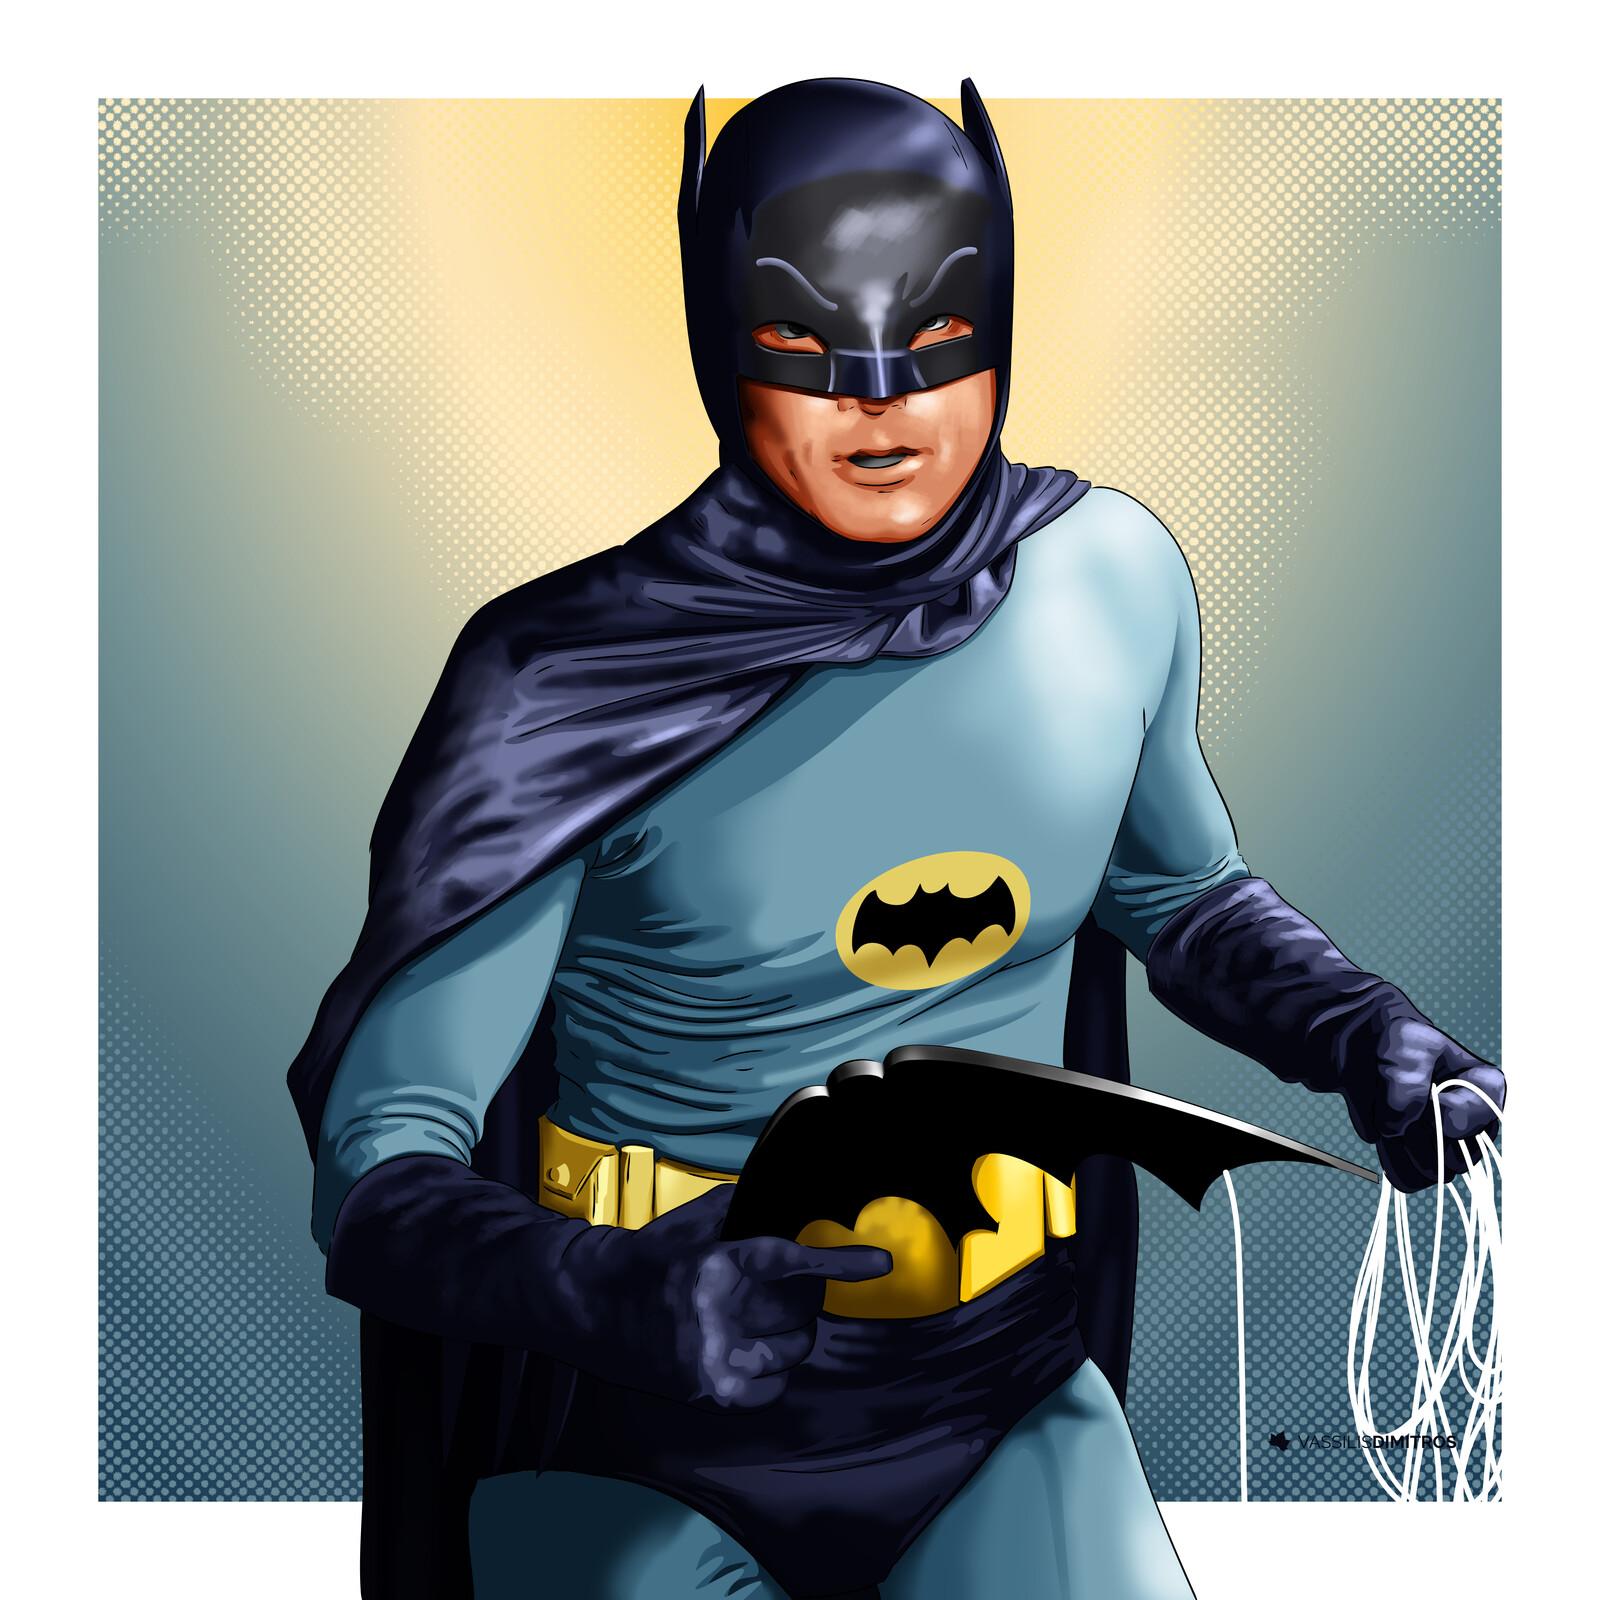 Adam West Batman (1966 TV Series)